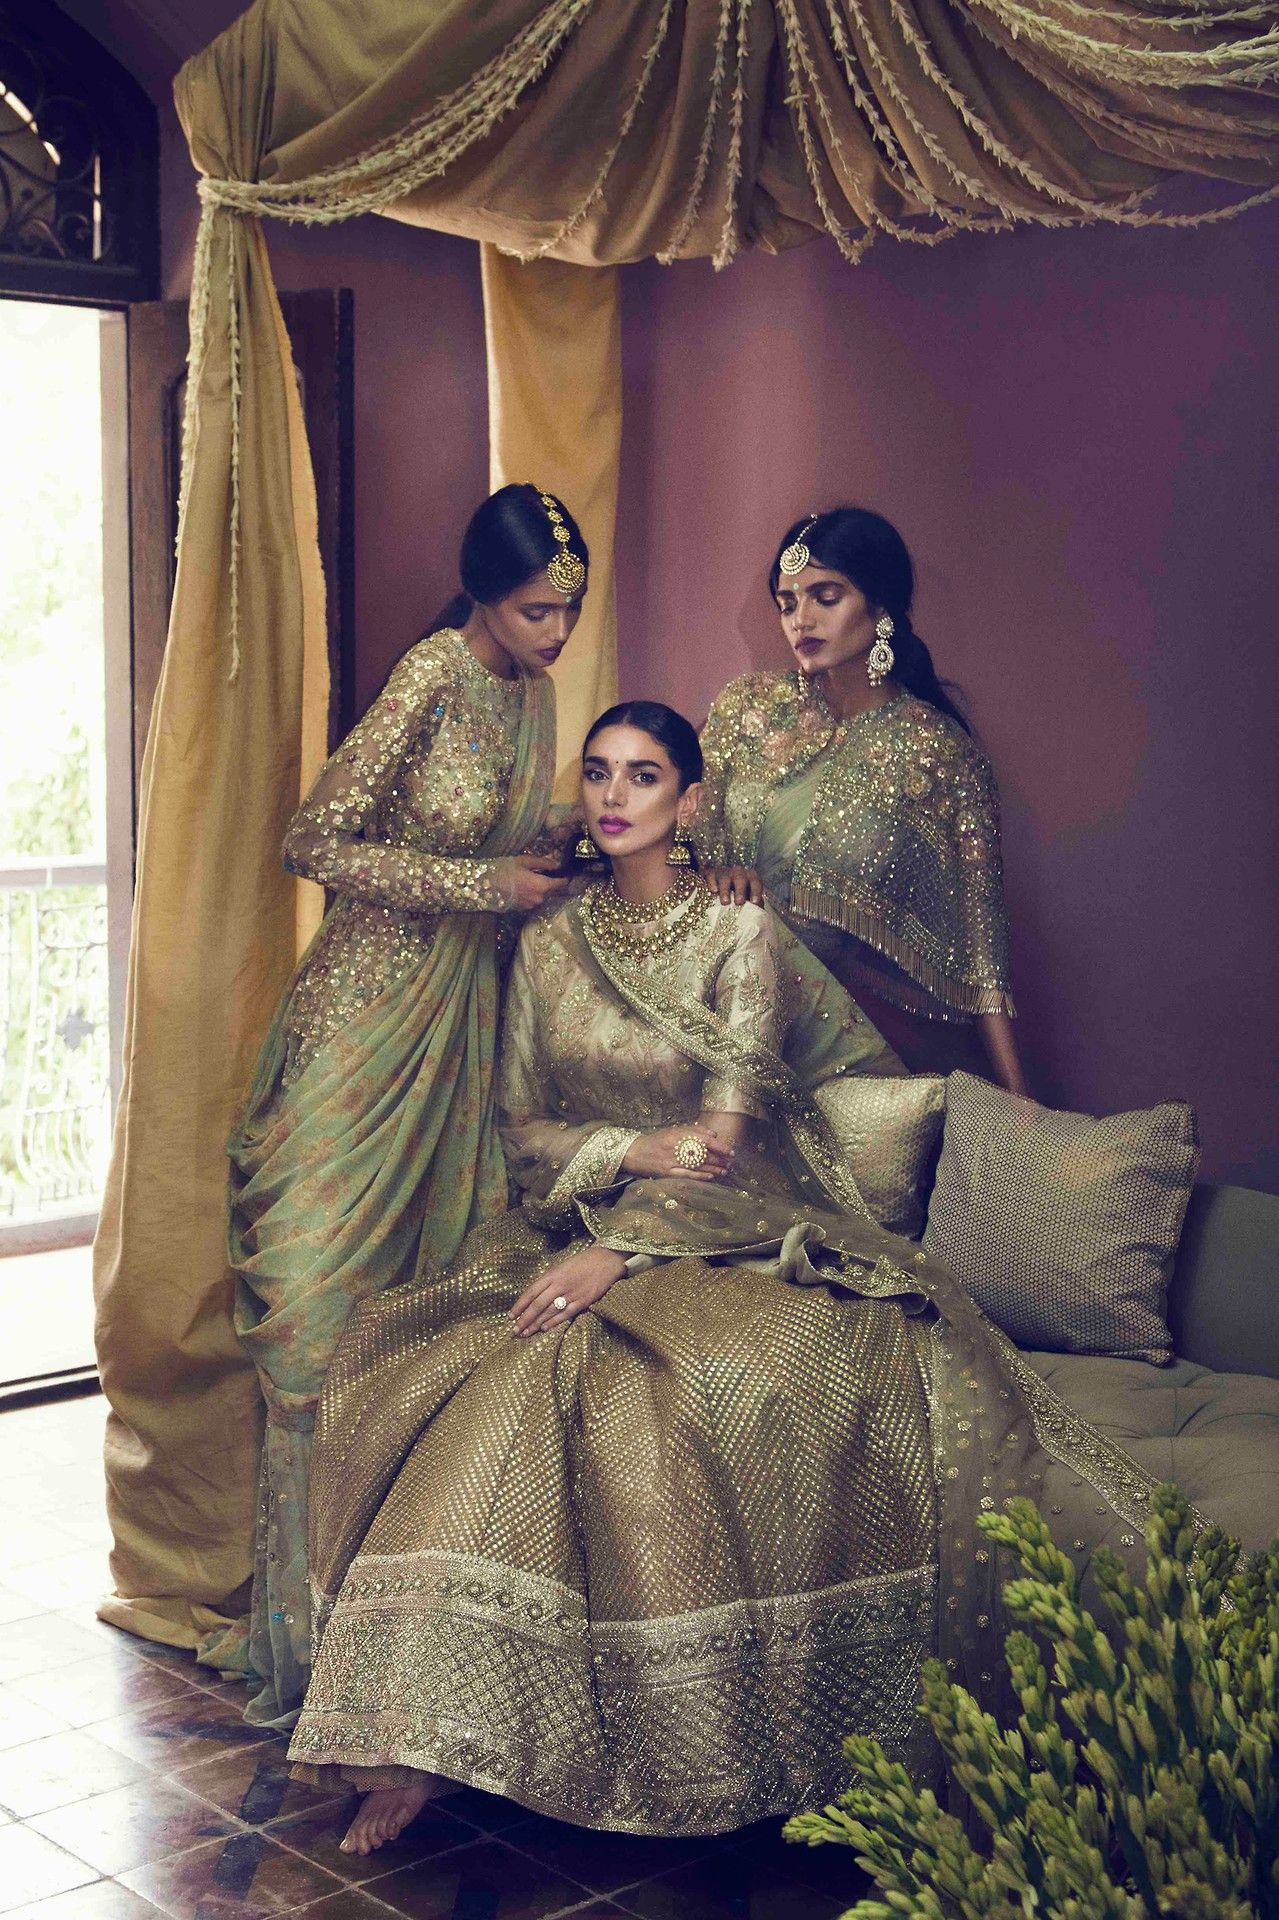 Hindu wedding dress  Pin by Janks Janks on Dream Hindu Wedding  Pinterest  Pakistani